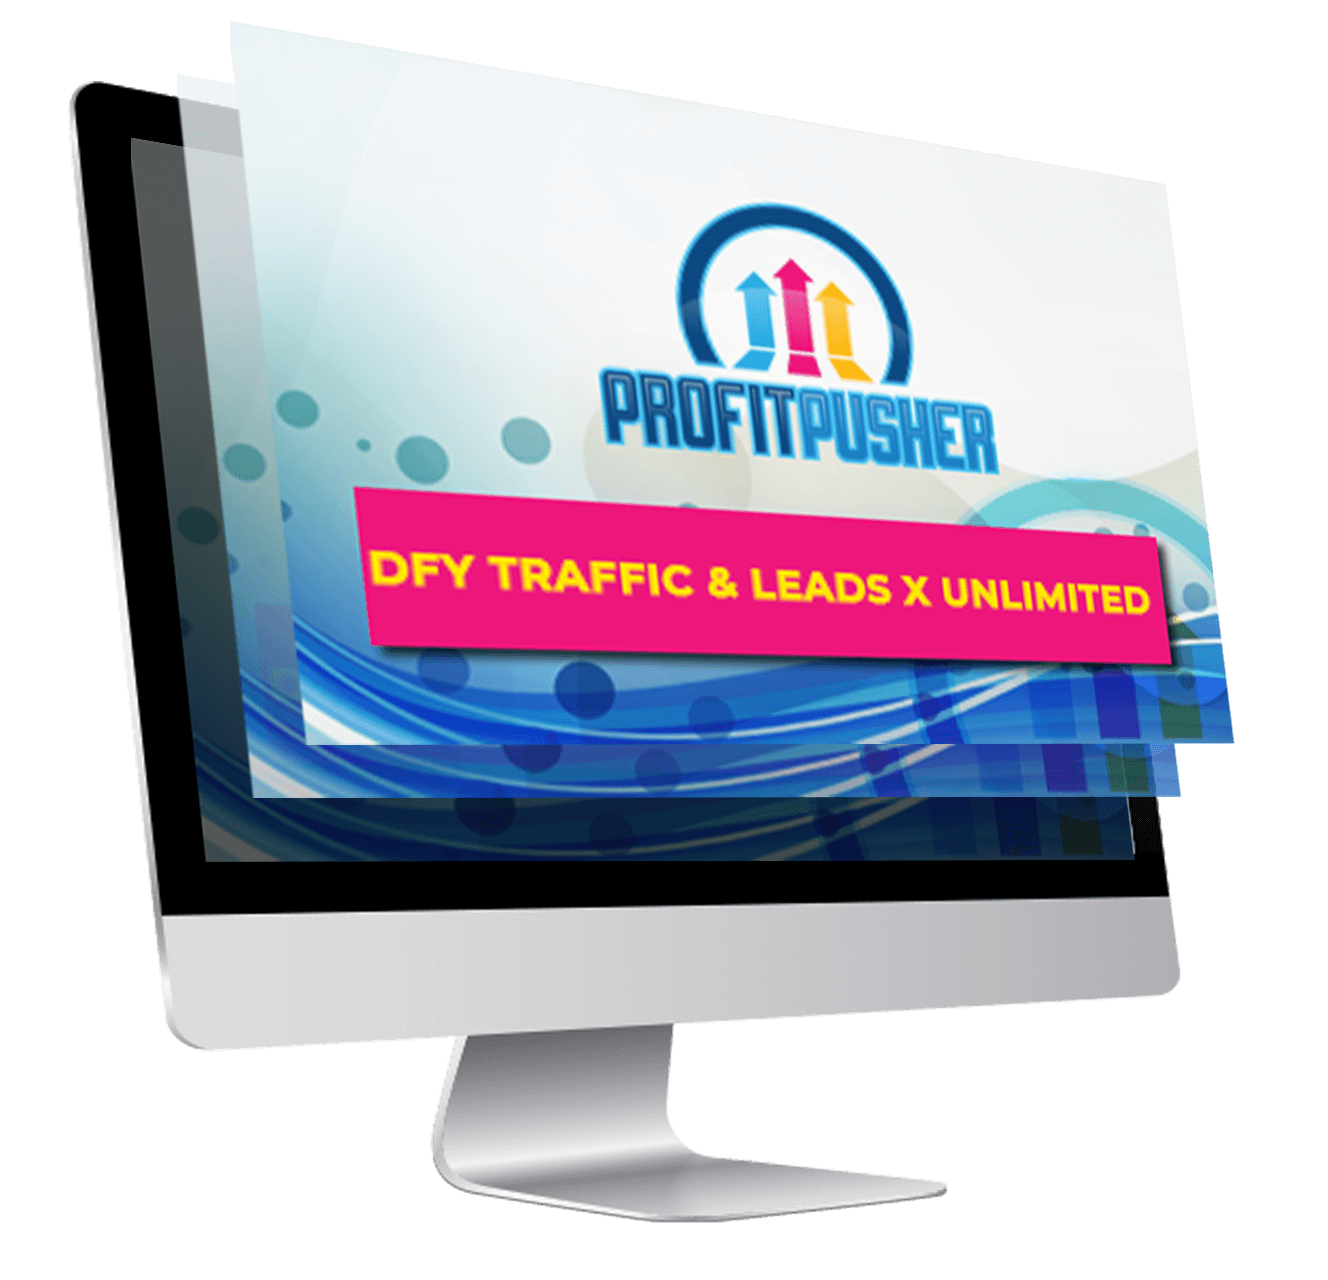 Profit-Pusher-feature-5